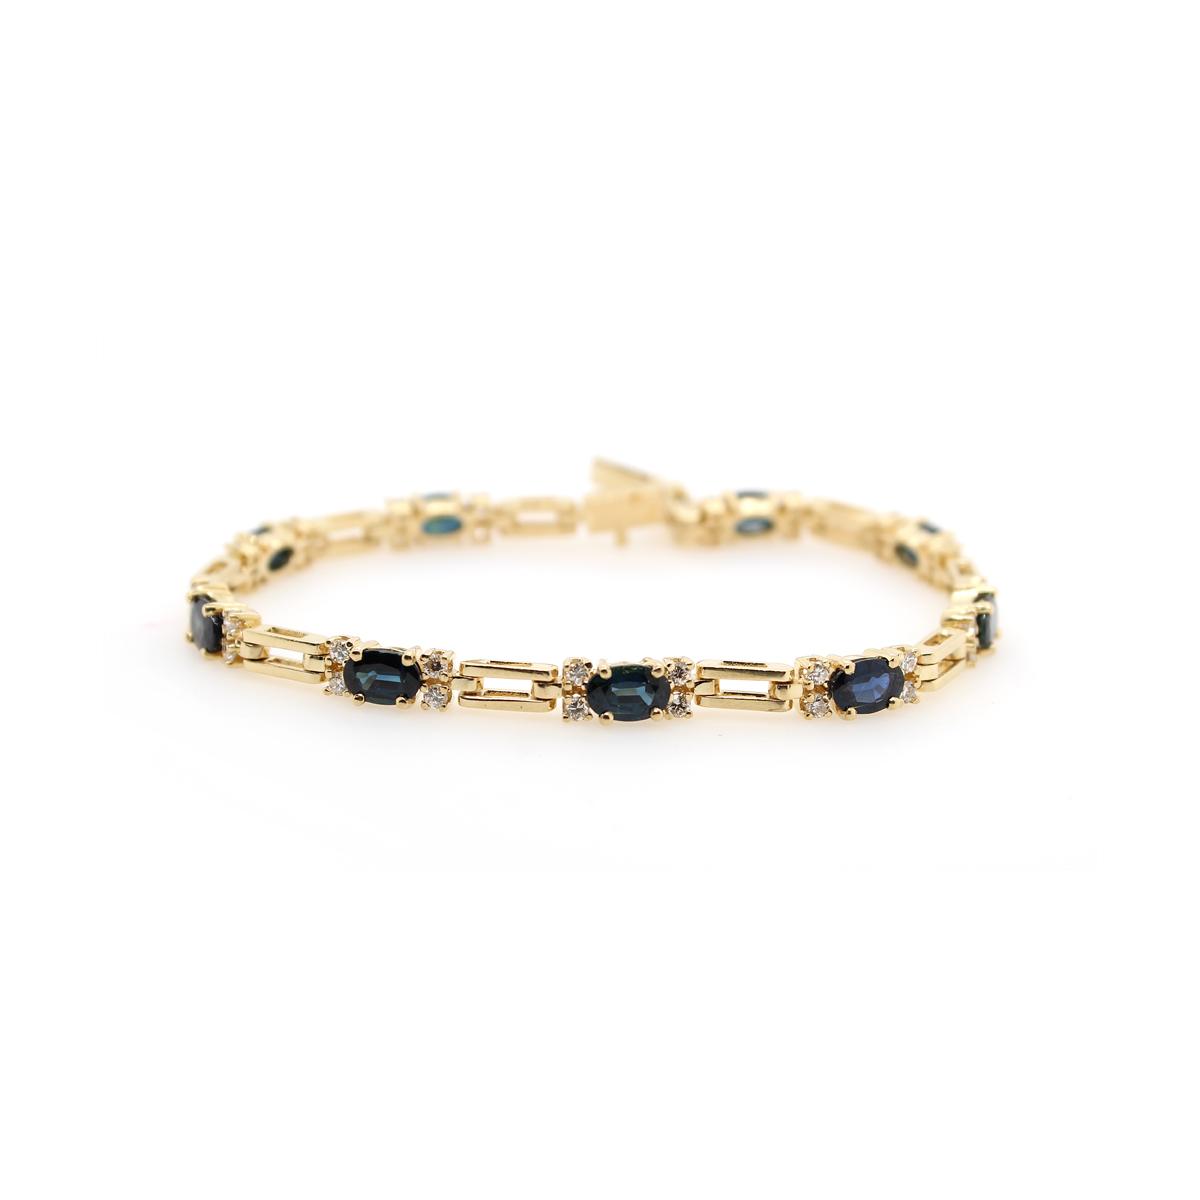 Vintage 14 Karat Yellow Gold Oval Blue Sapphire and Diamond Link Bracelet